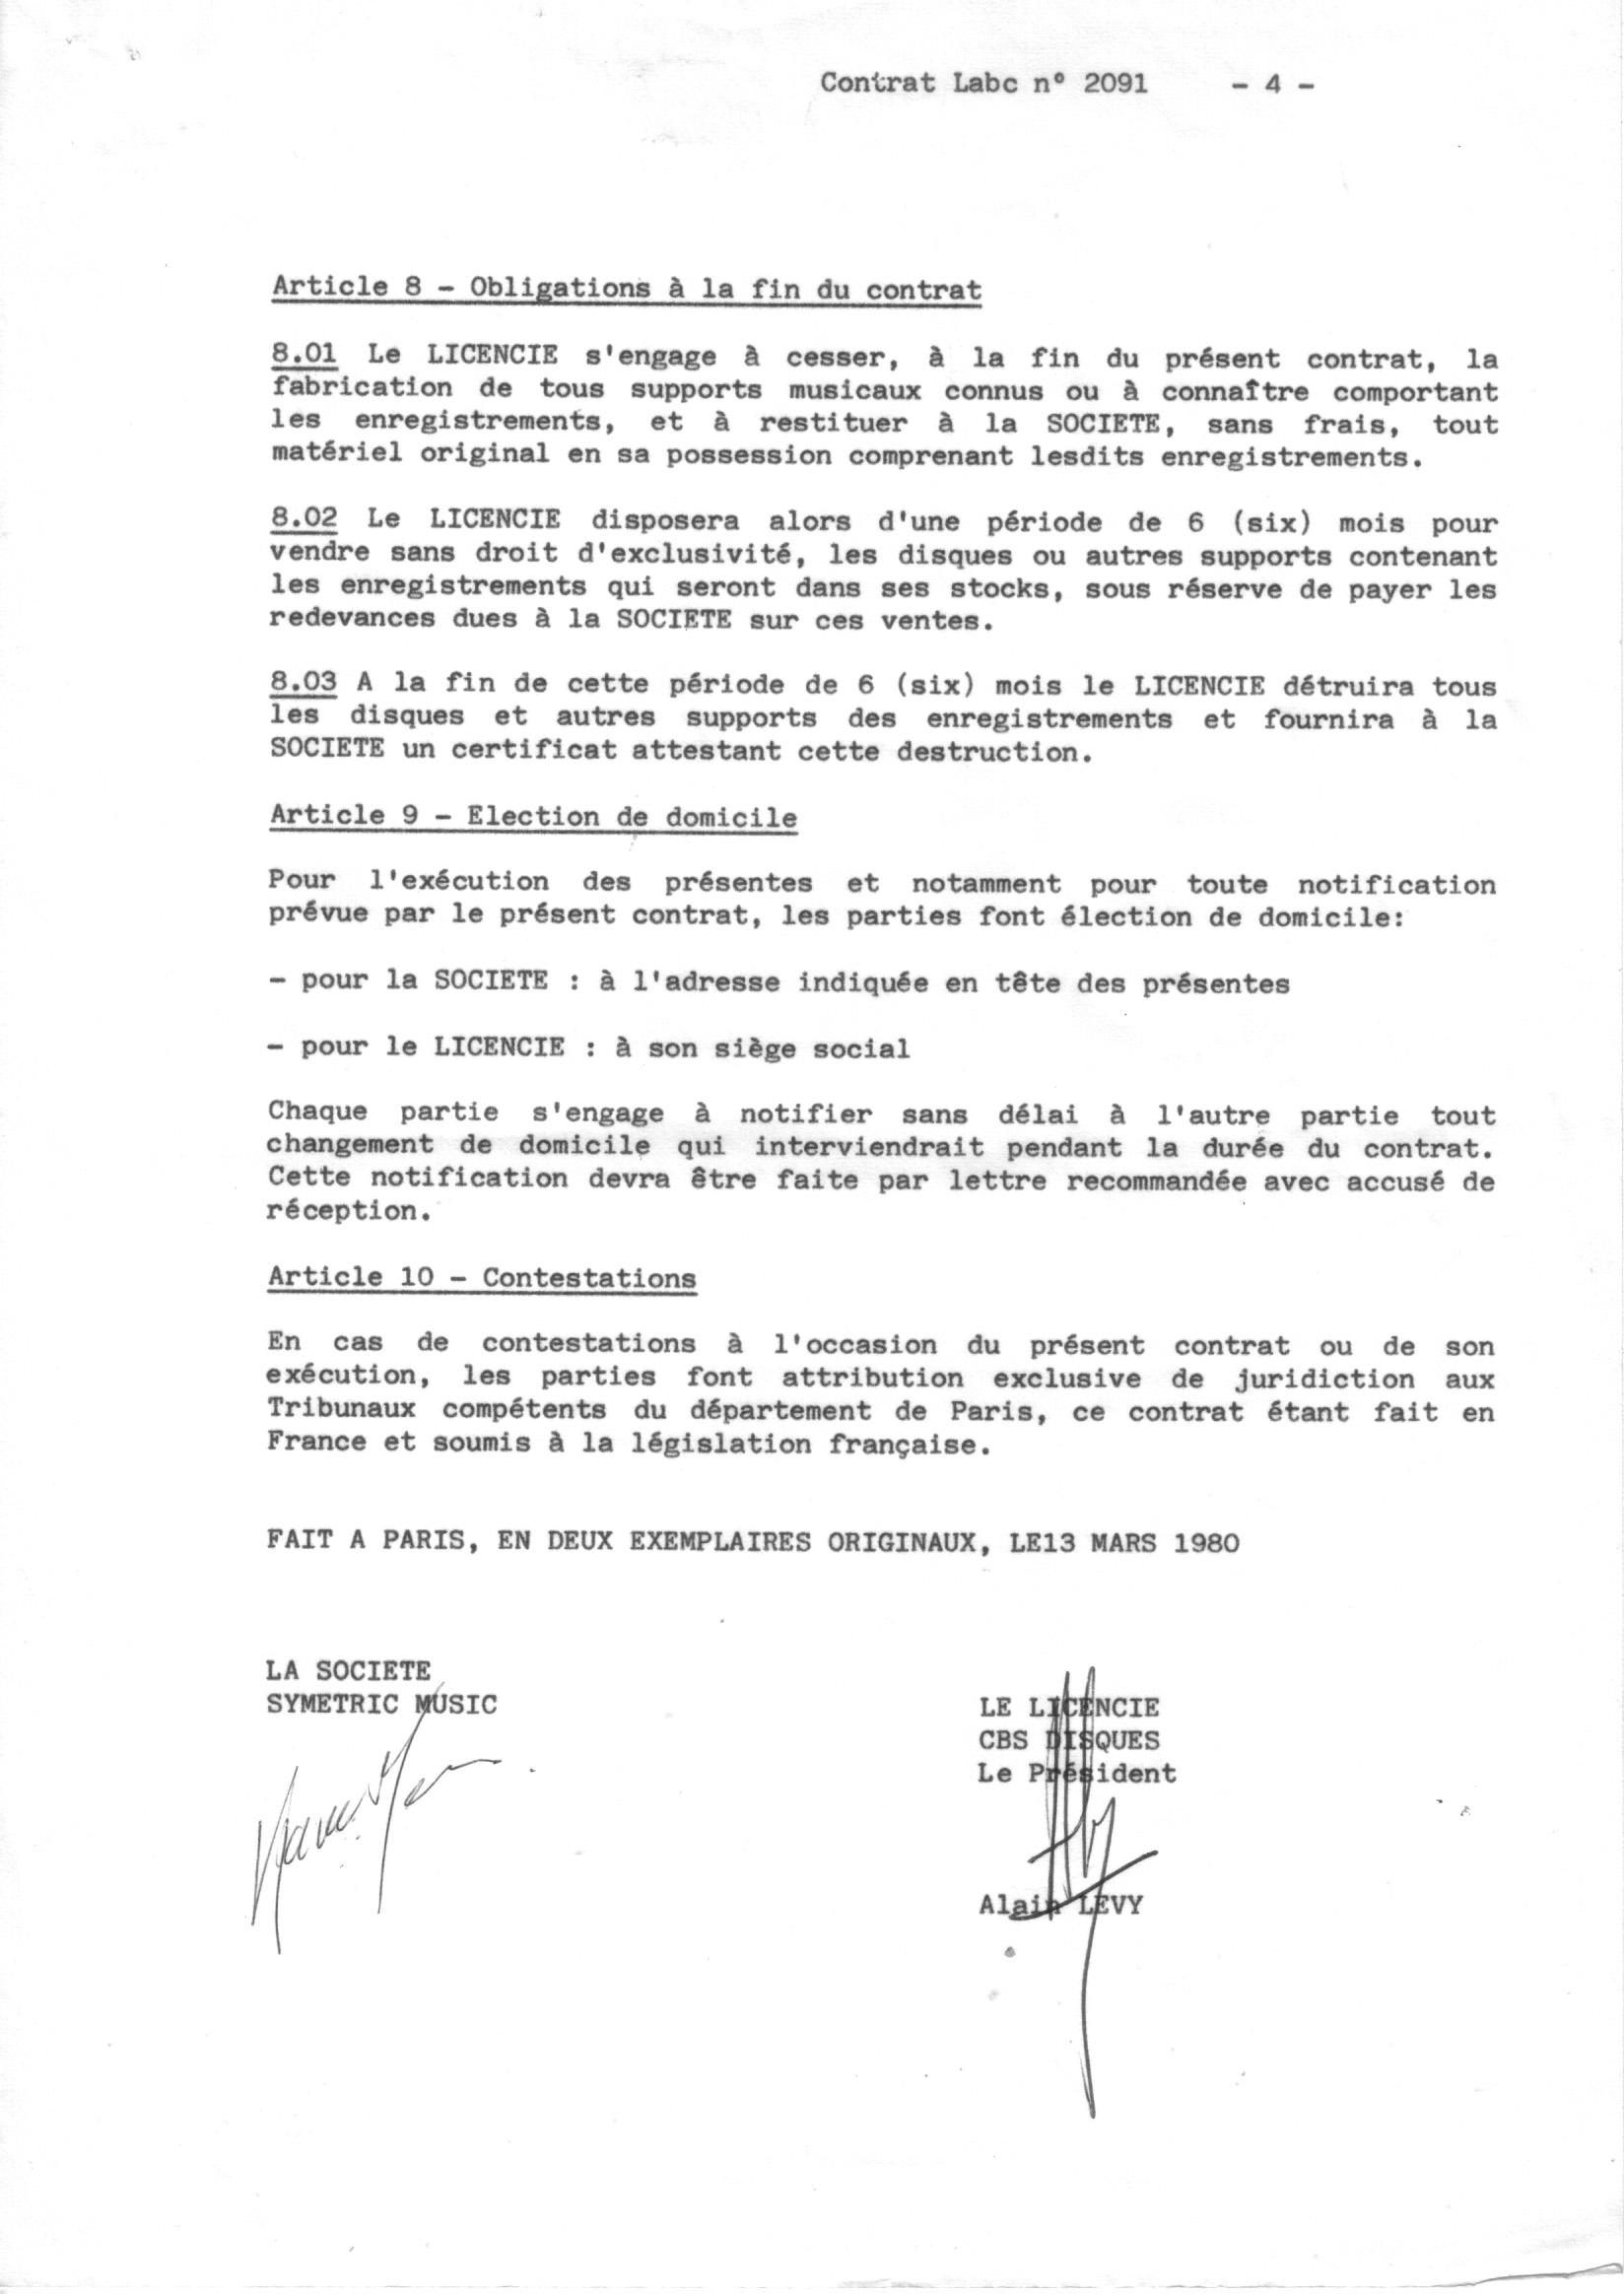 Index Of Presse Thehypotheticalprophets Bio Assets Original Contract